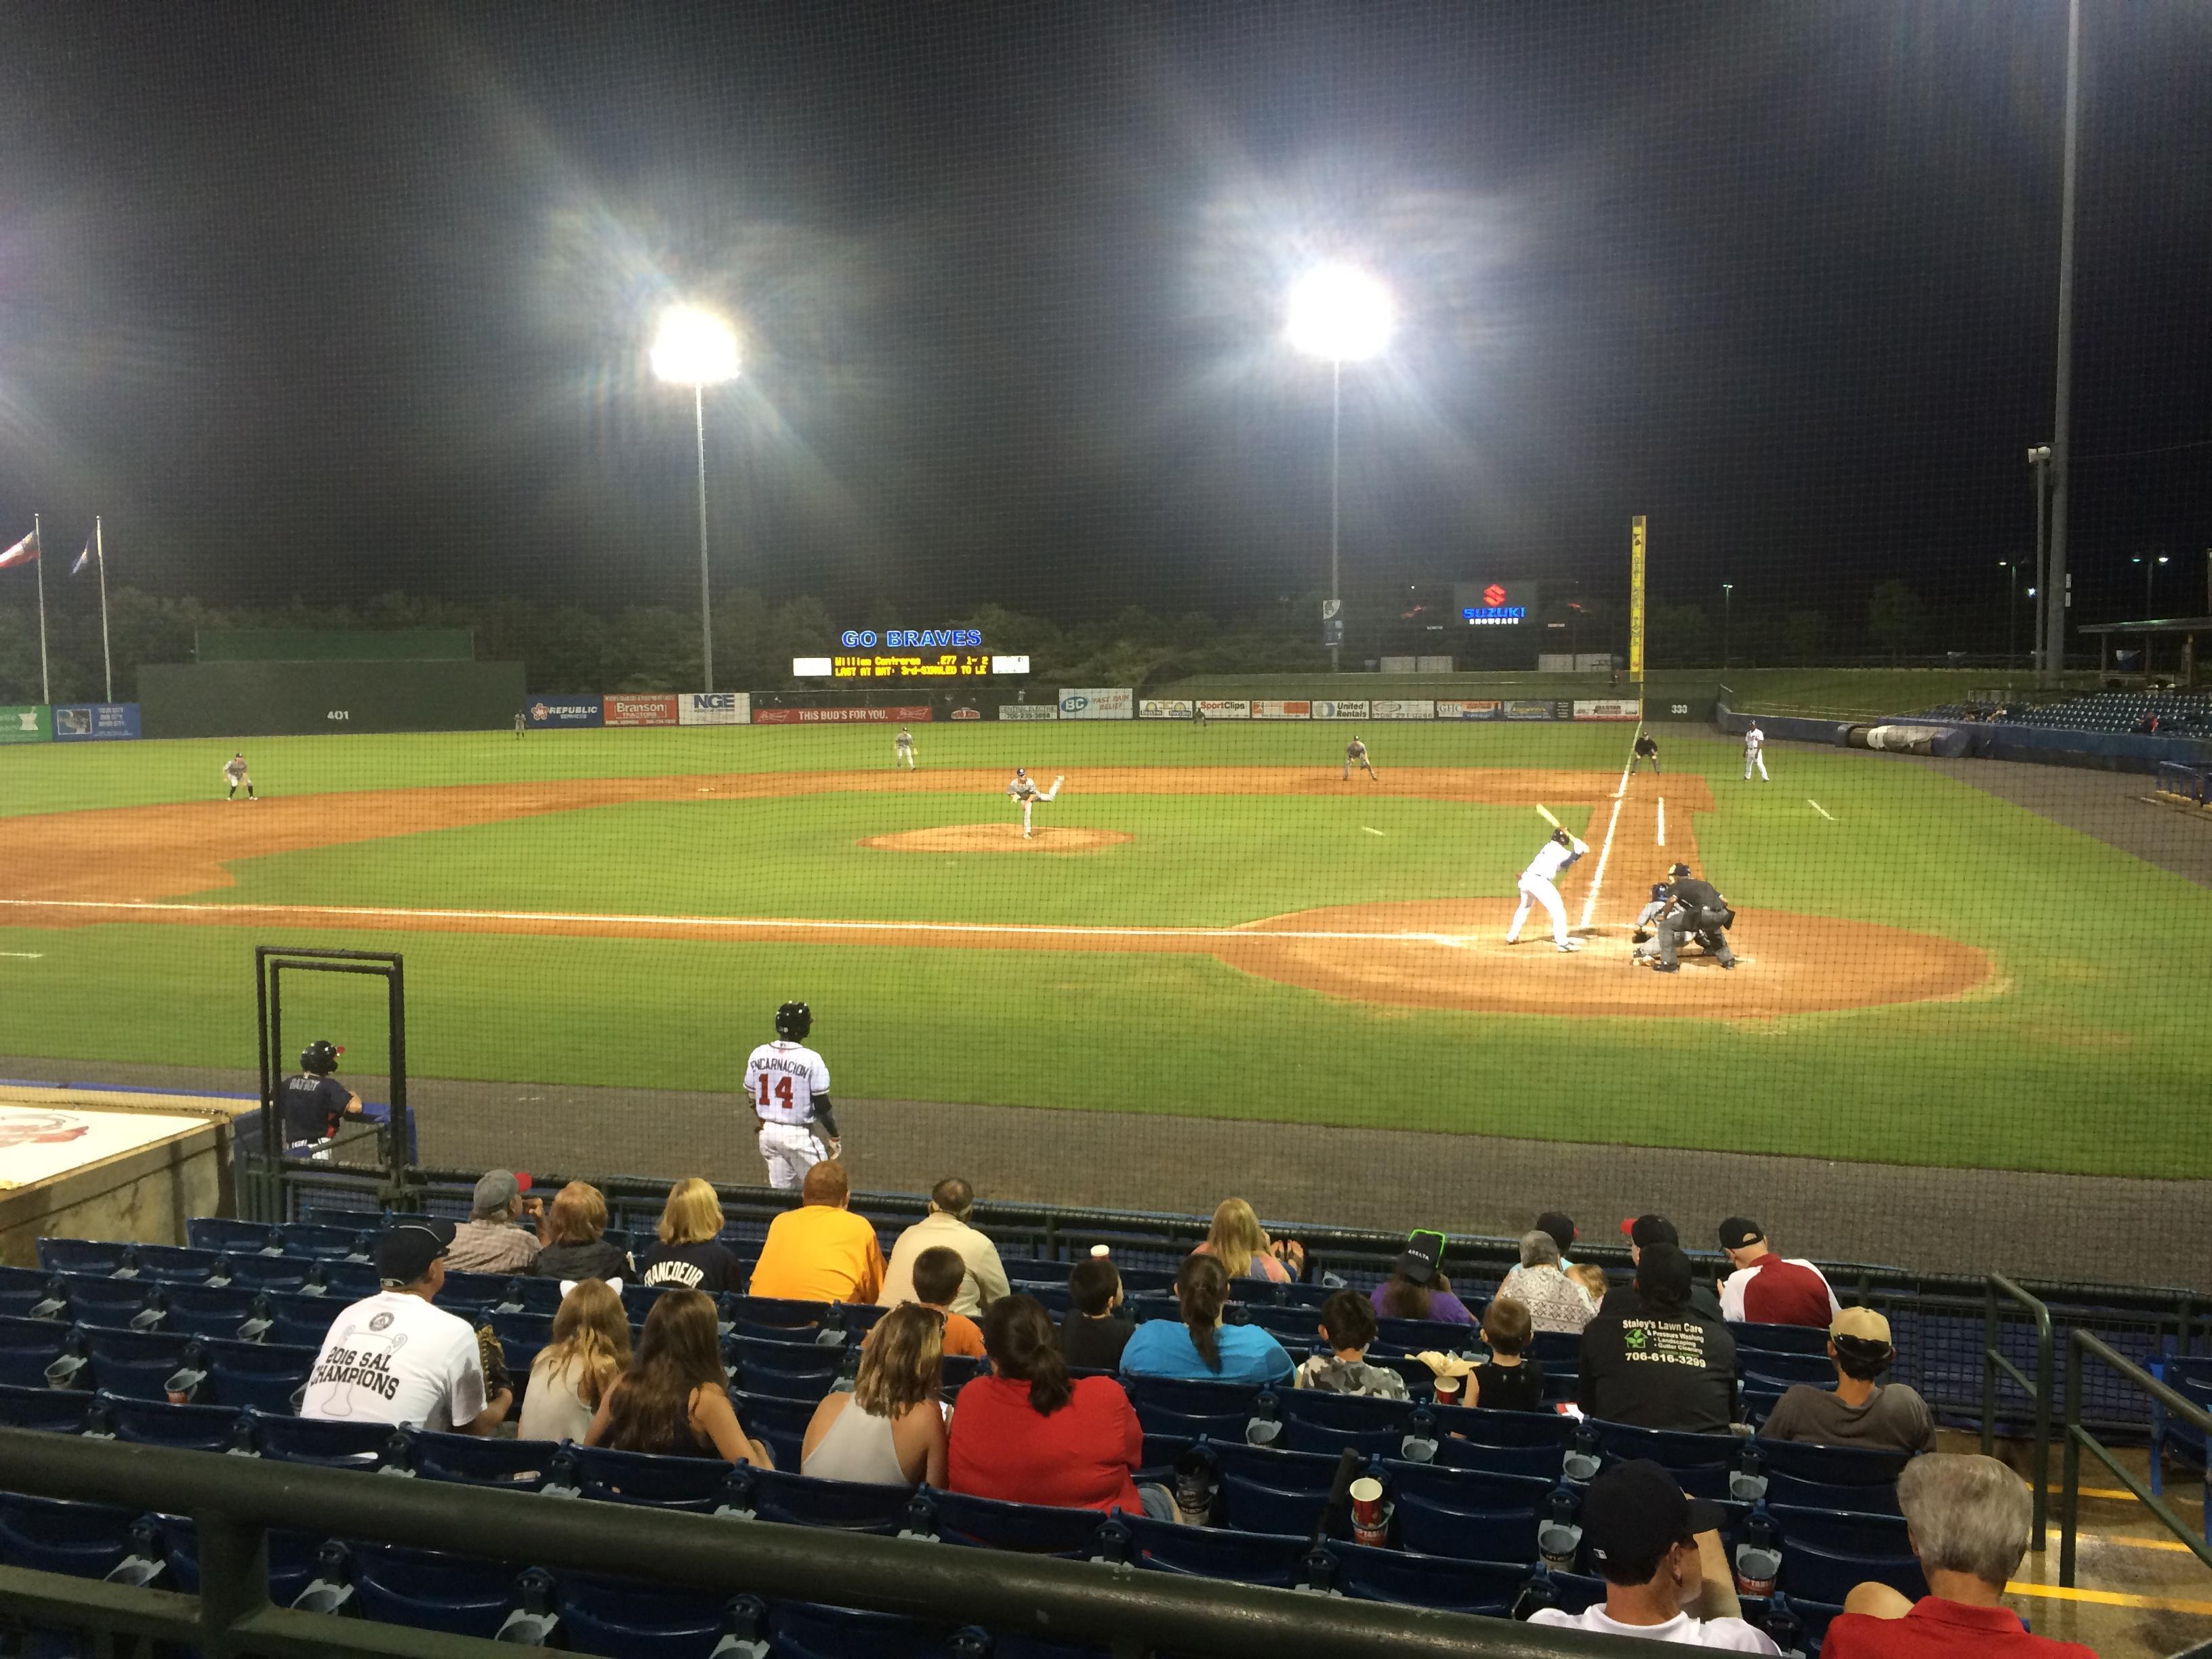 State Mutual Stadium Secção 206 Fila 2 Lugar 2